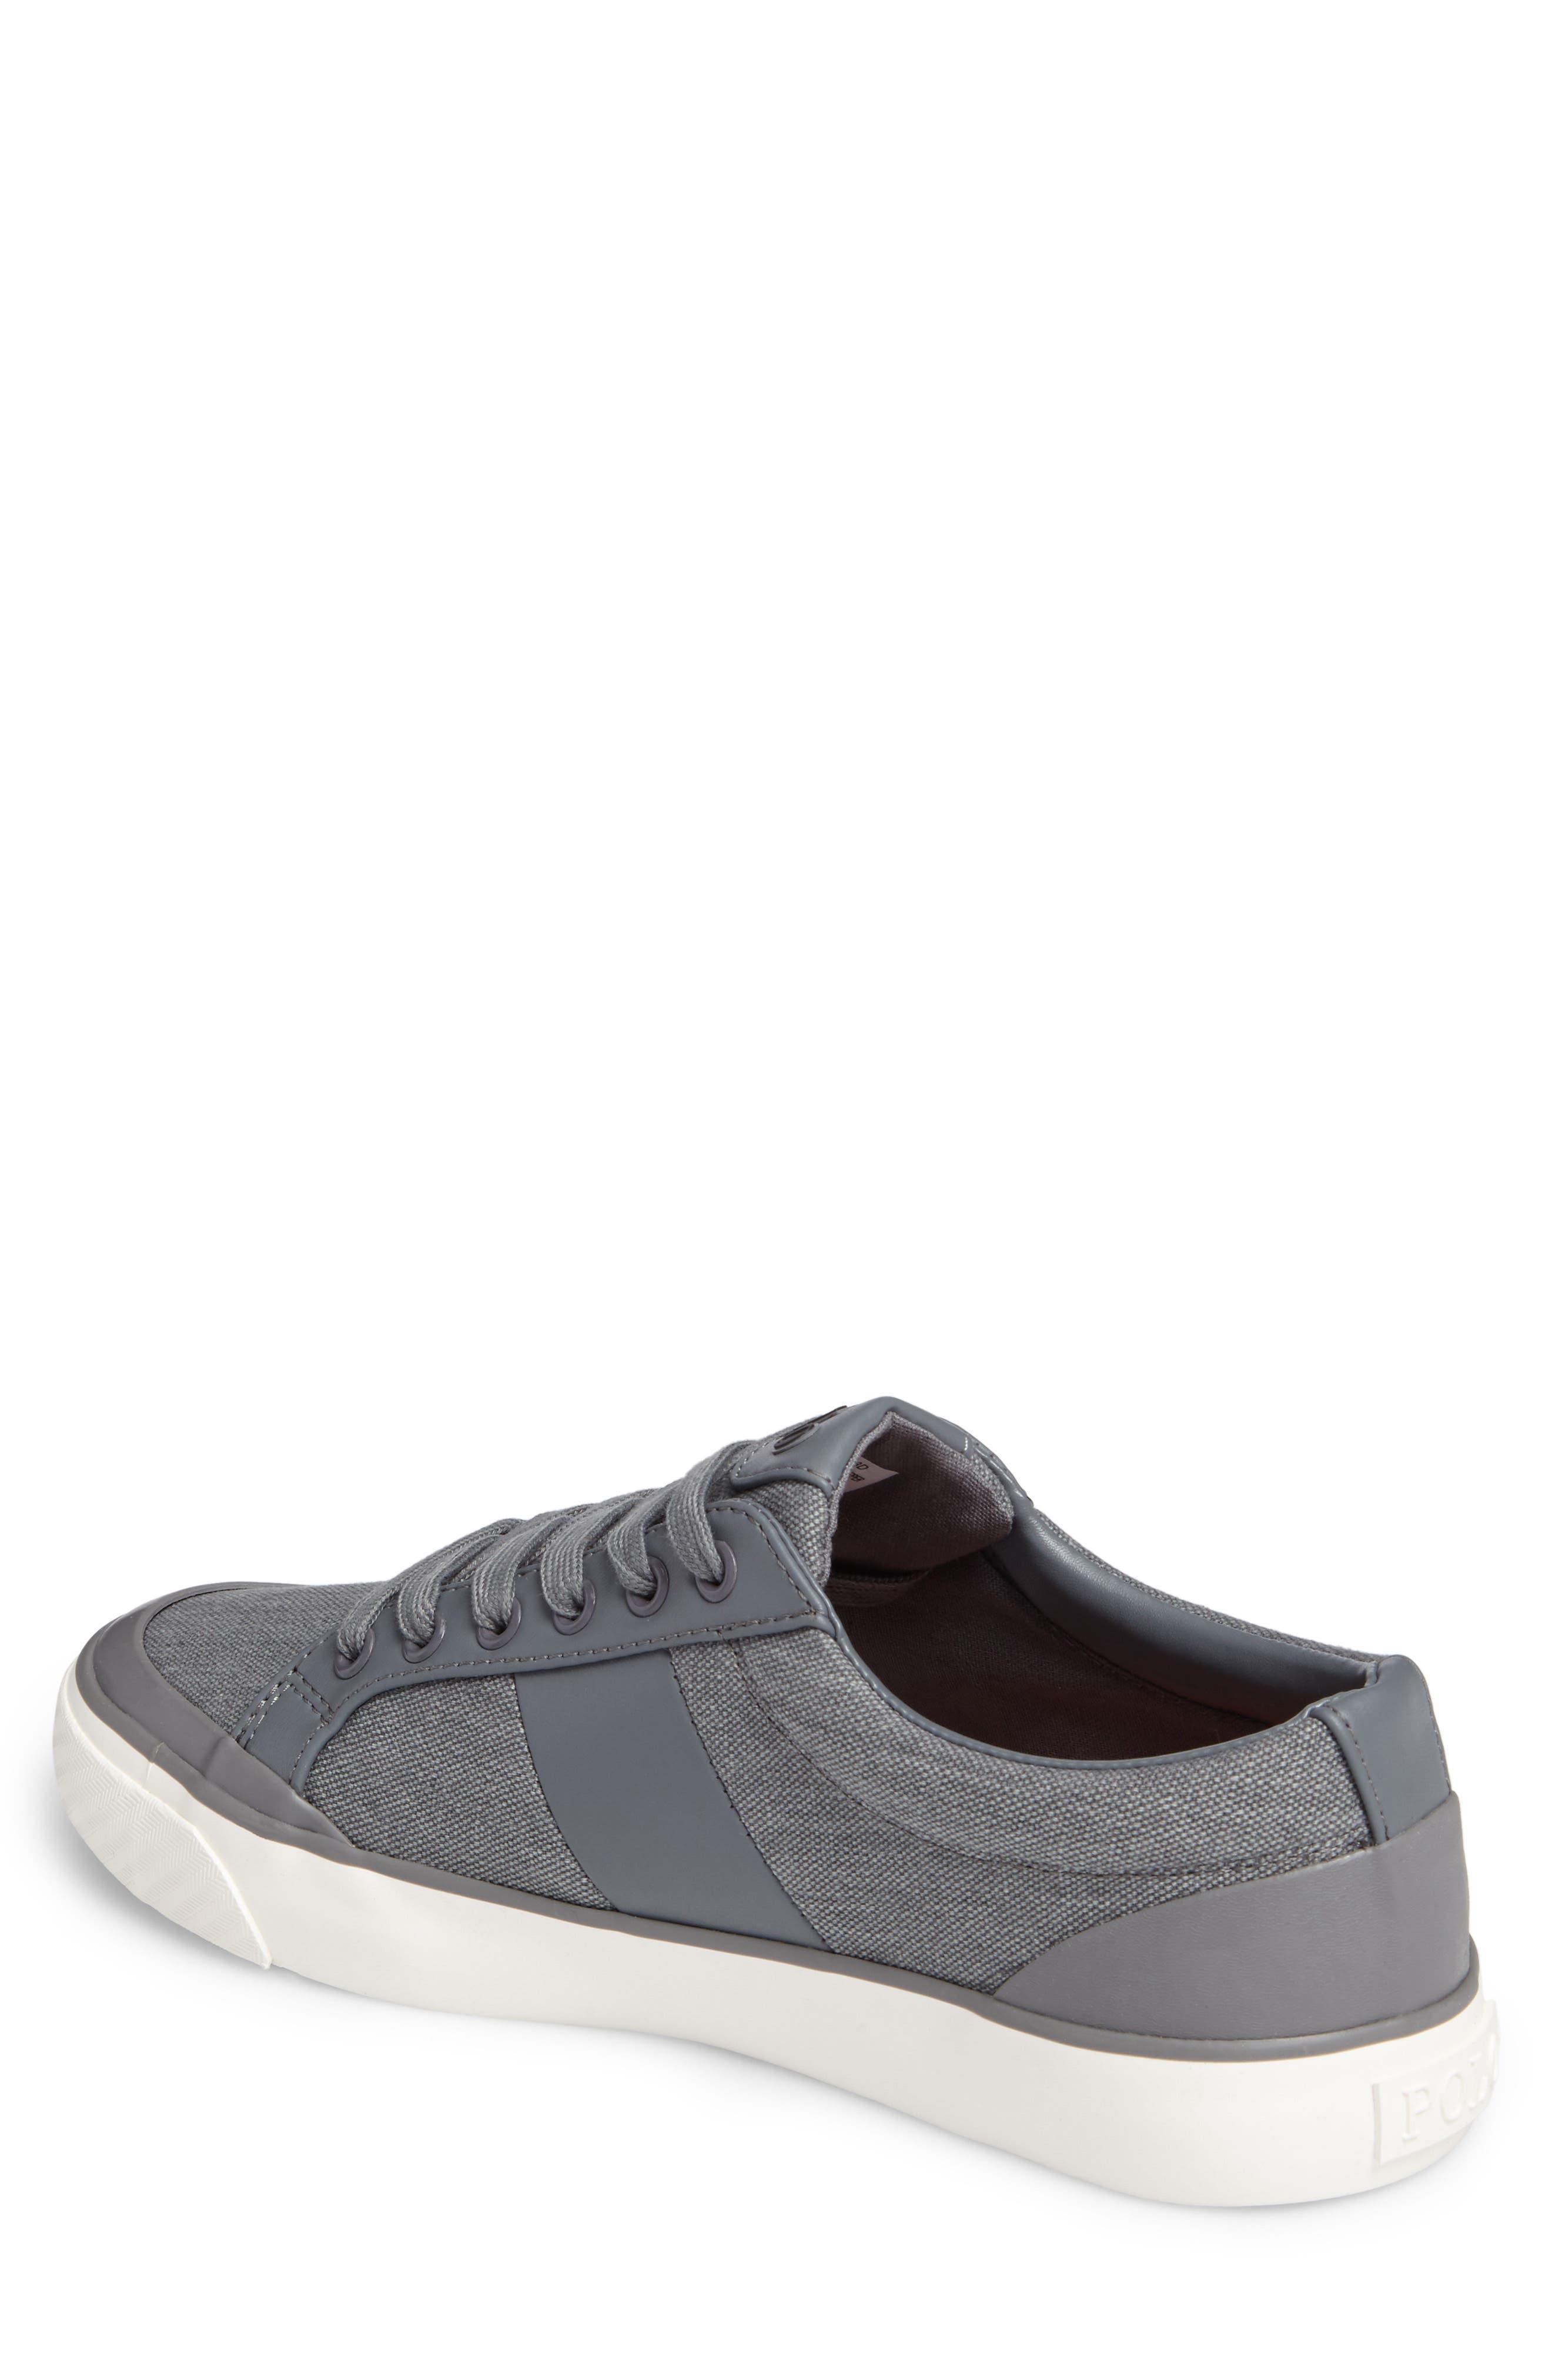 Polo Ralph Lauren Ian Sneaker,                             Alternate thumbnail 2, color,                             Slate